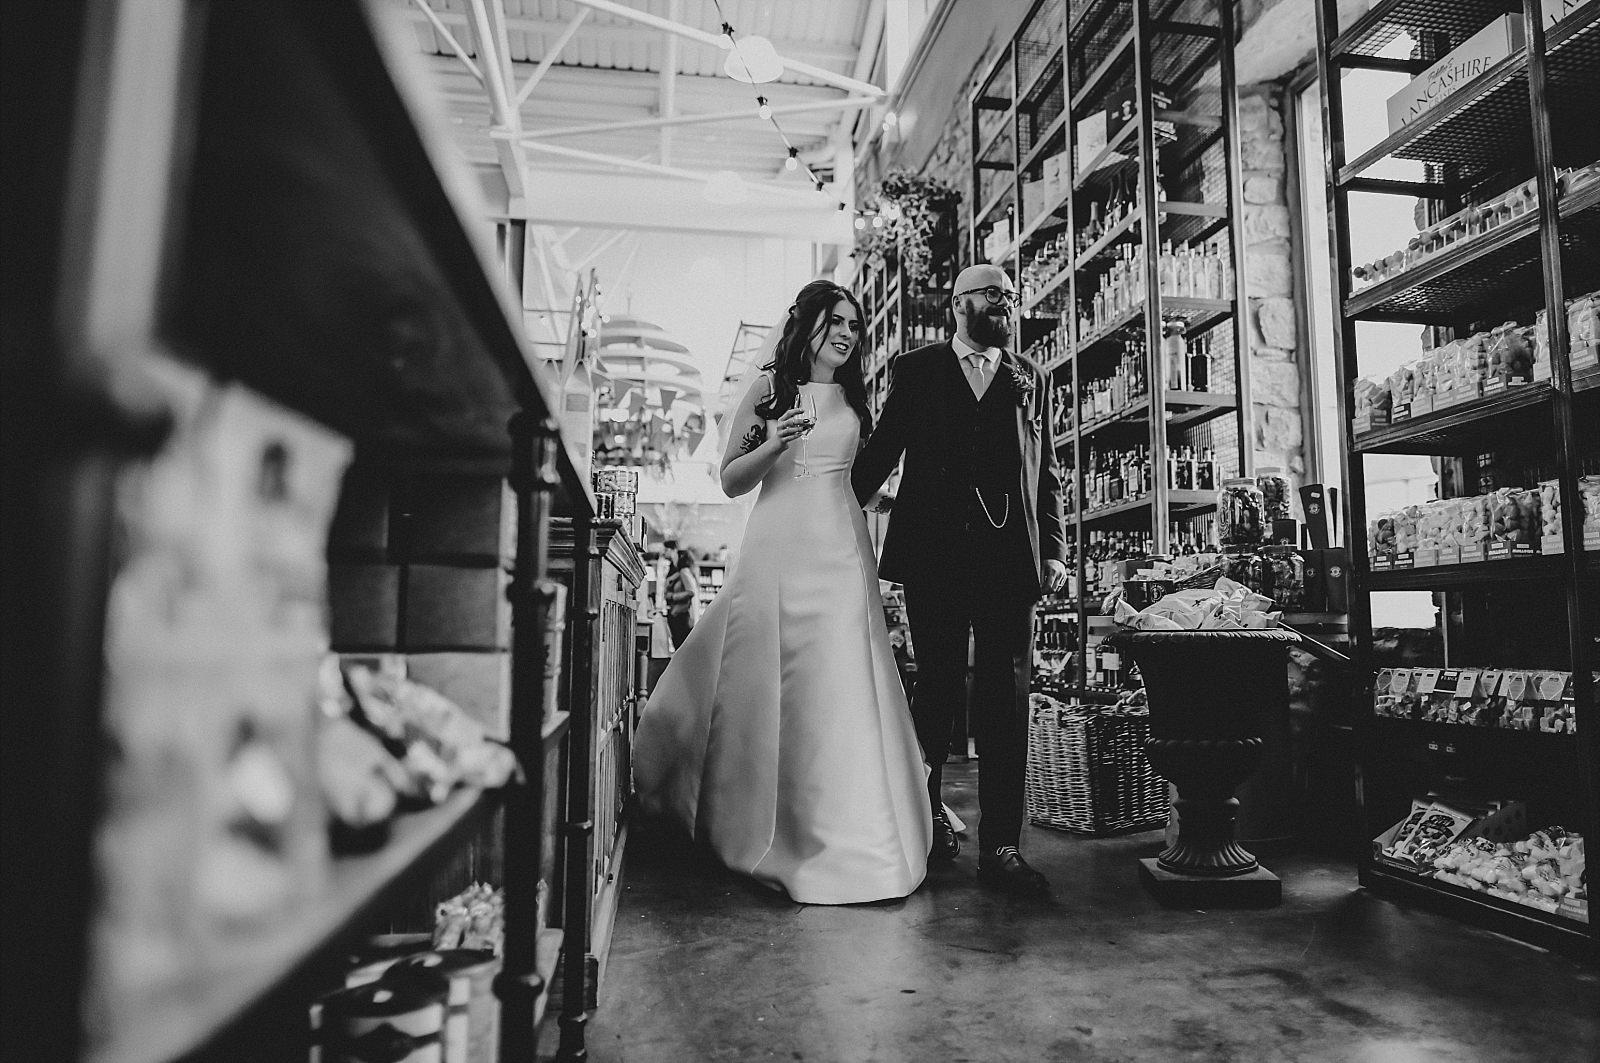 groom and bride walking hand in hand